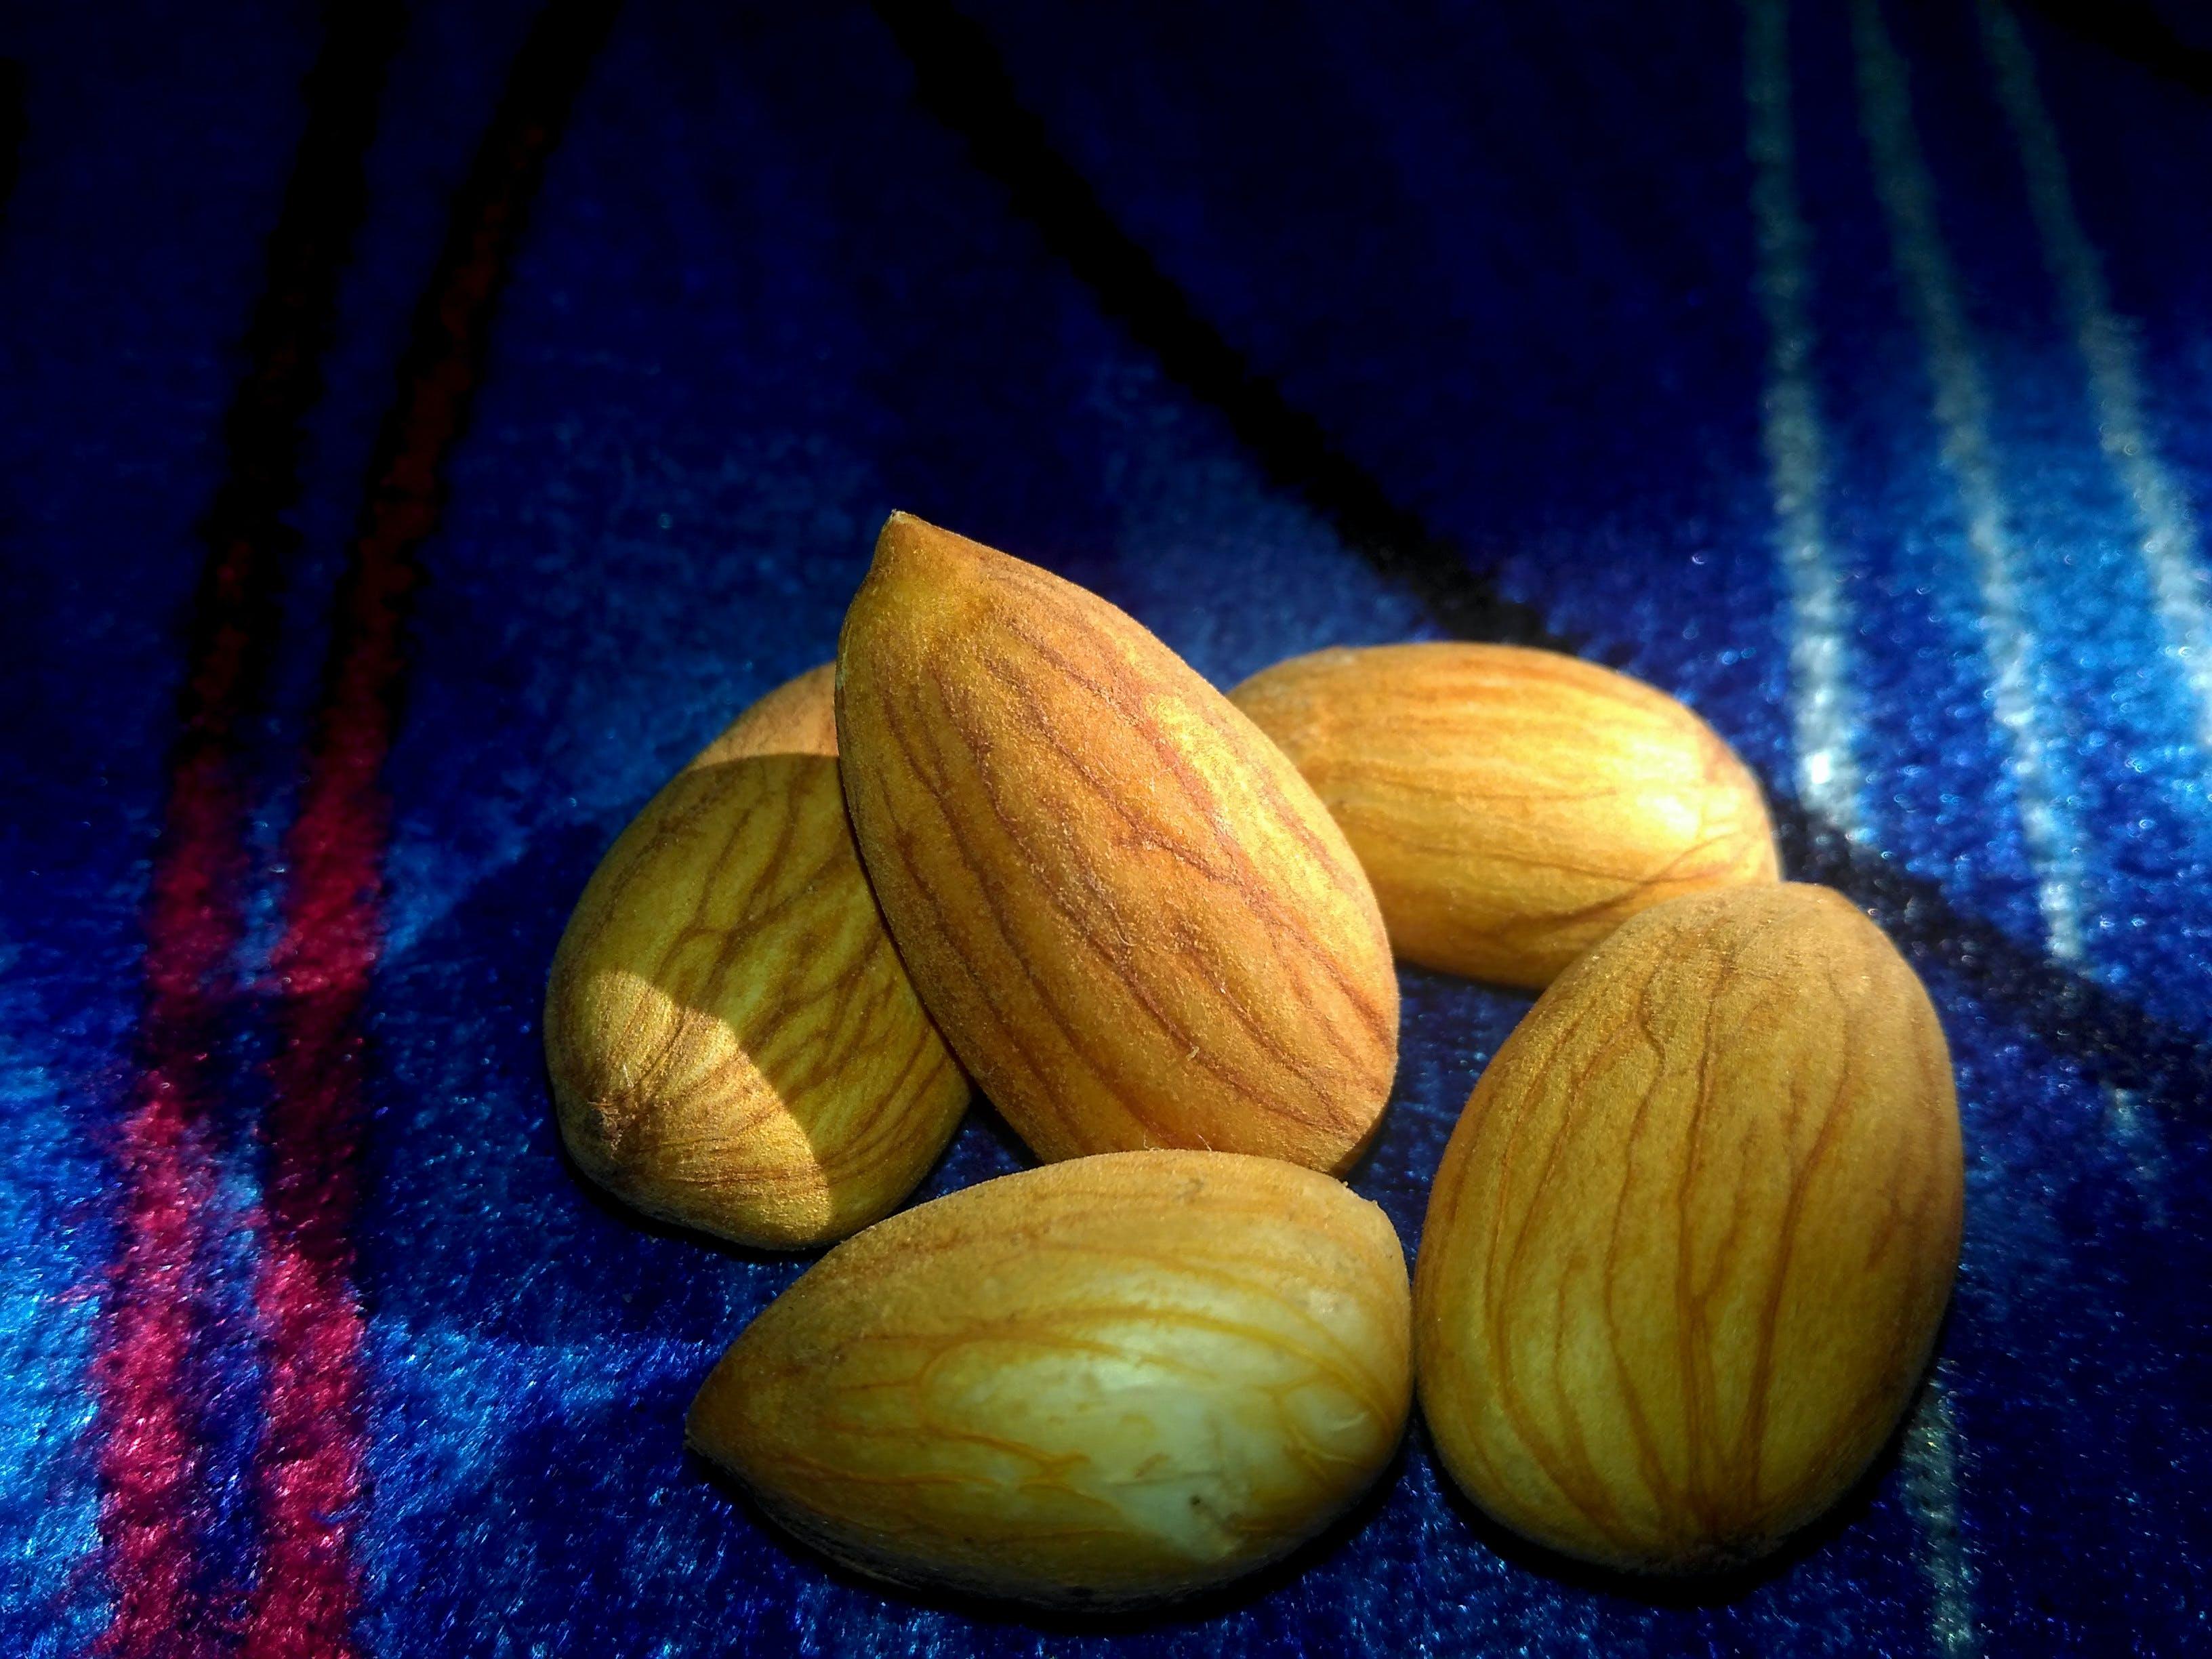 almond, almonds, dry fruit